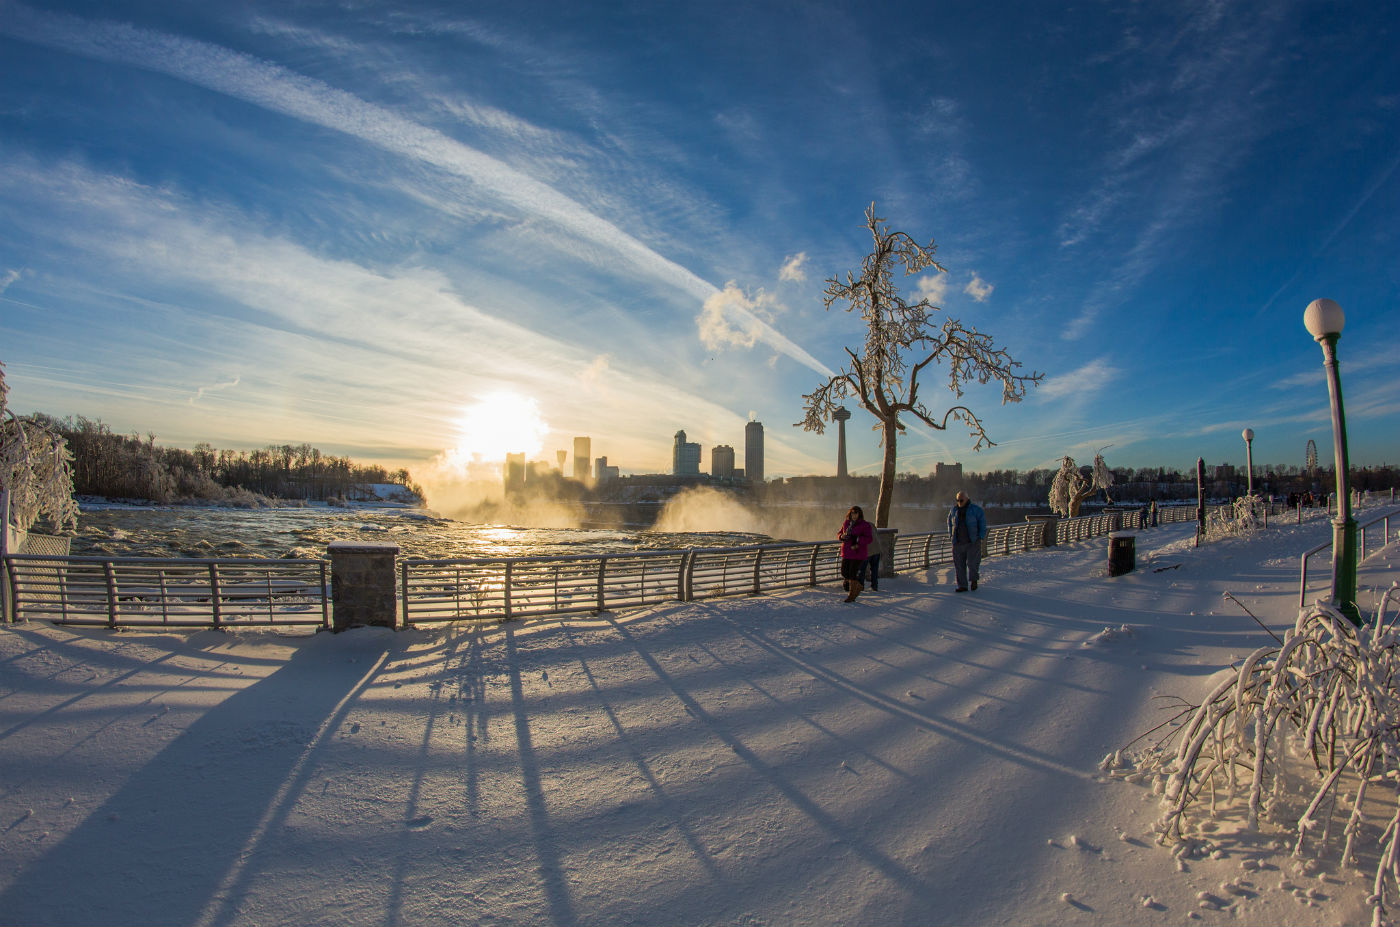 Winter in Niagara Falls, New York